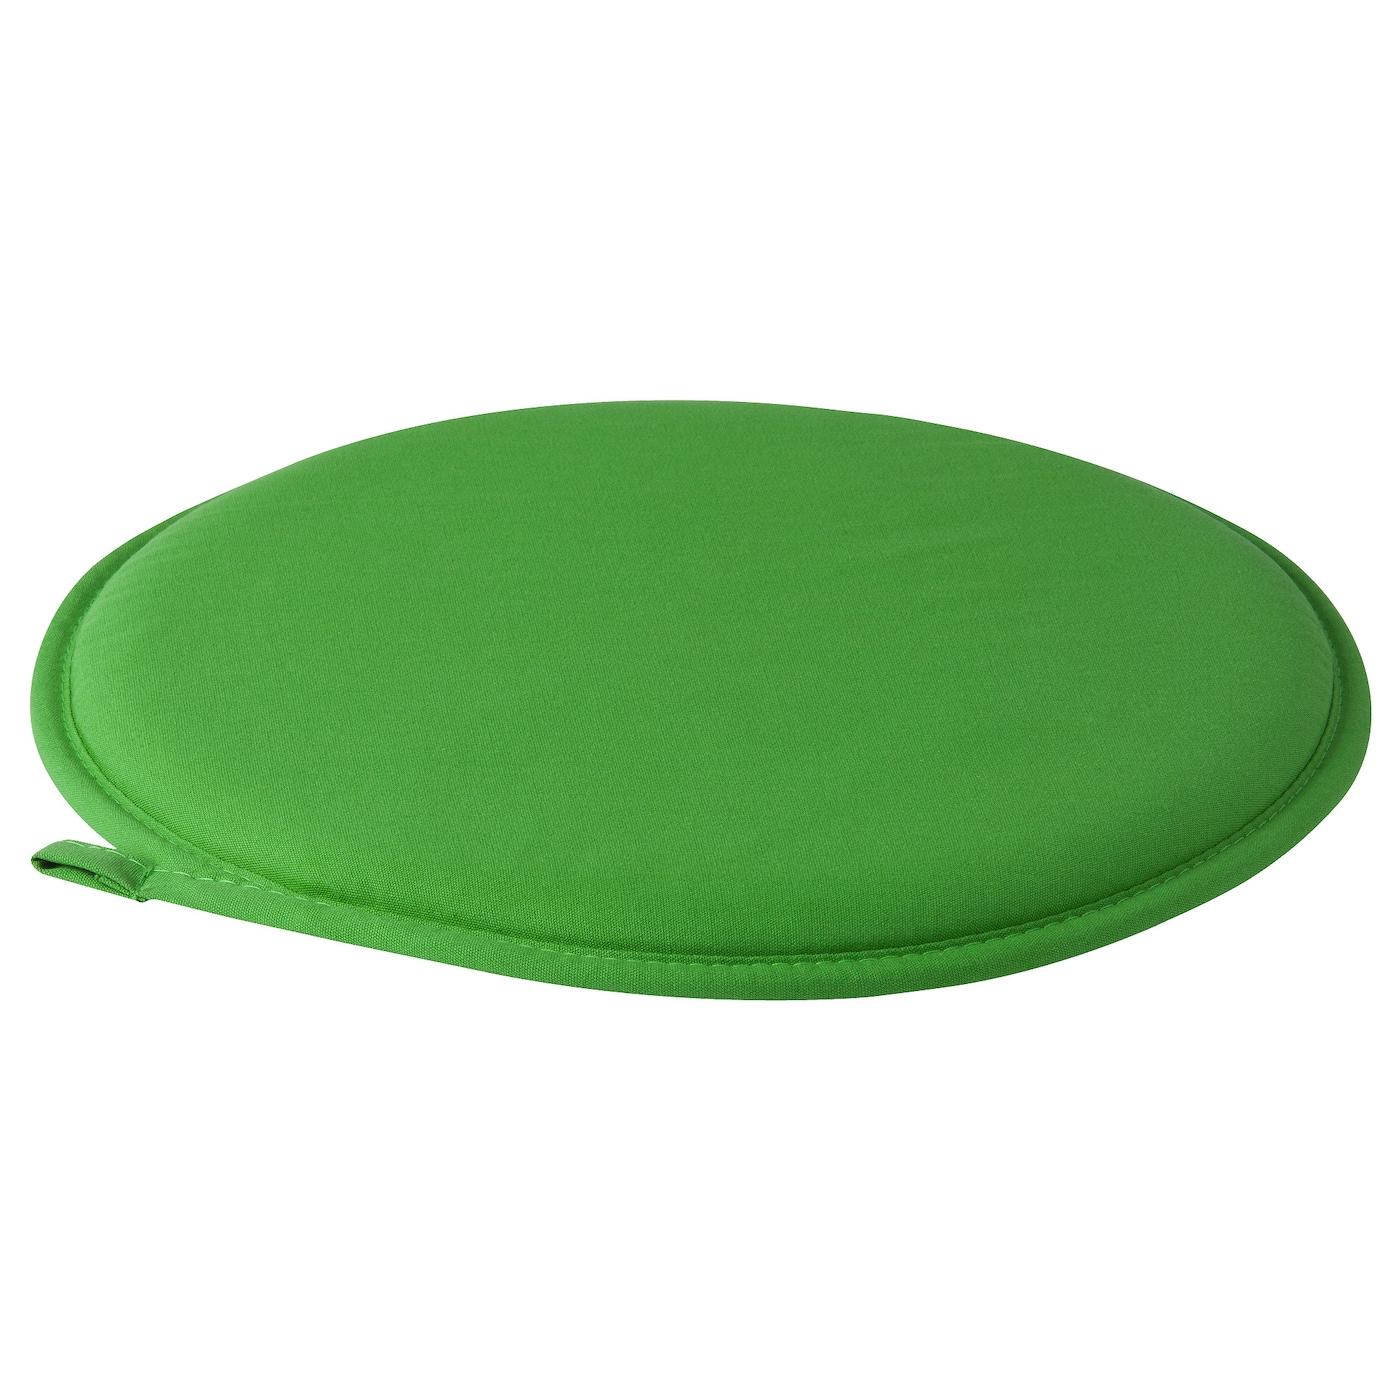 watch make cushions bench how ikea to youtube